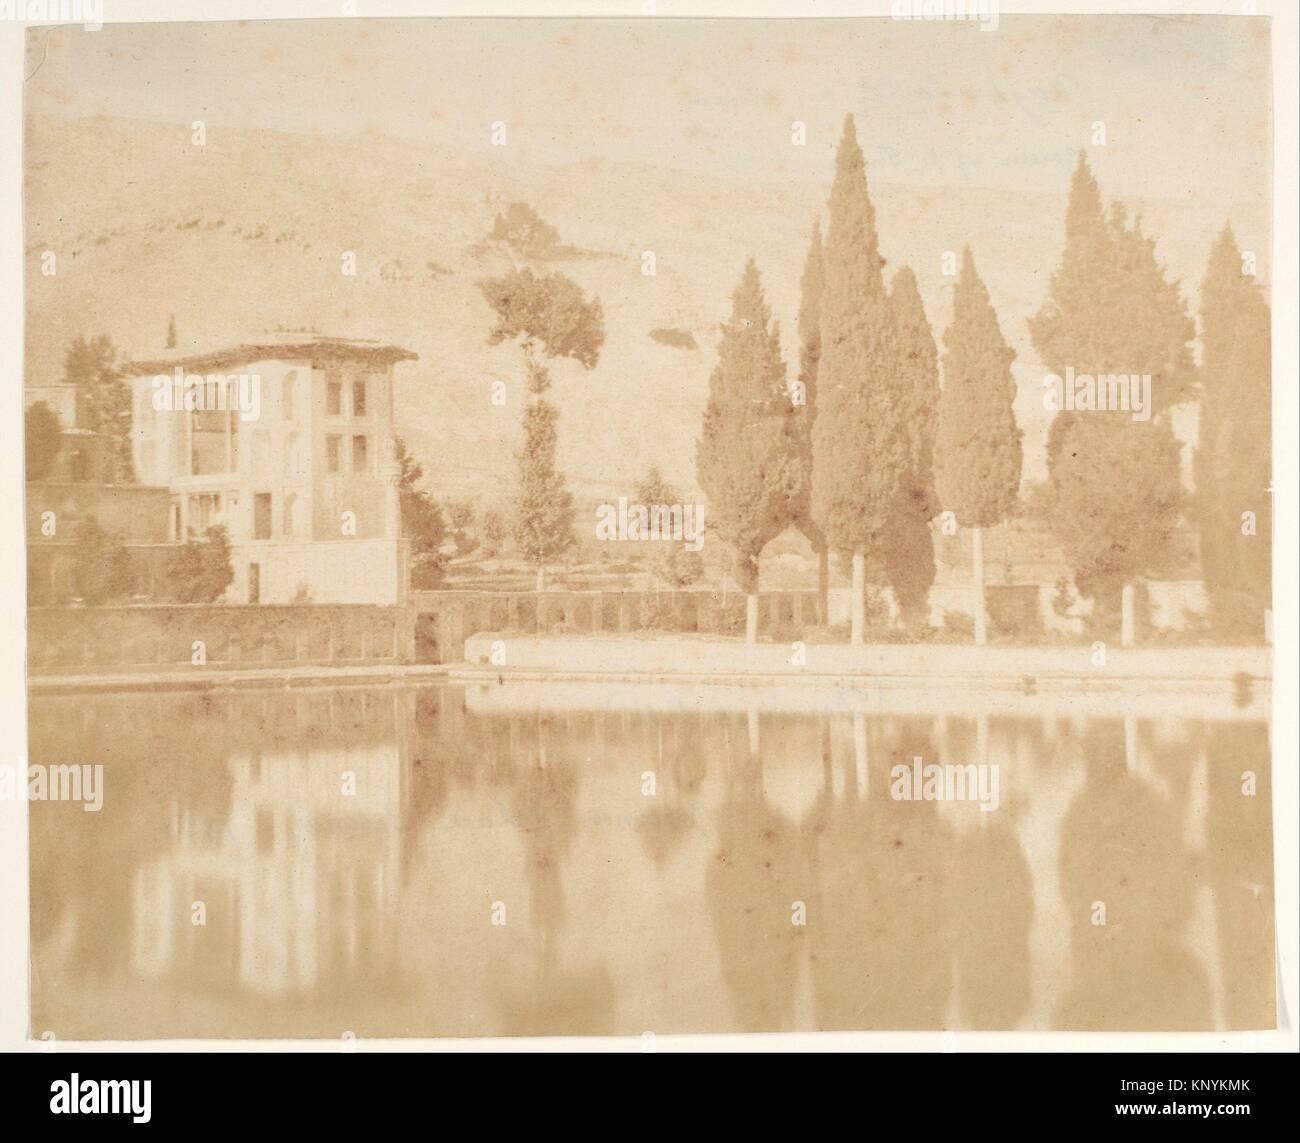 Bagh-takt a chiraz. Artist: Luigi Pesce (Italian, 1818-1891); Date: 1858; Medium: Salted paper print from paper - Stock Image